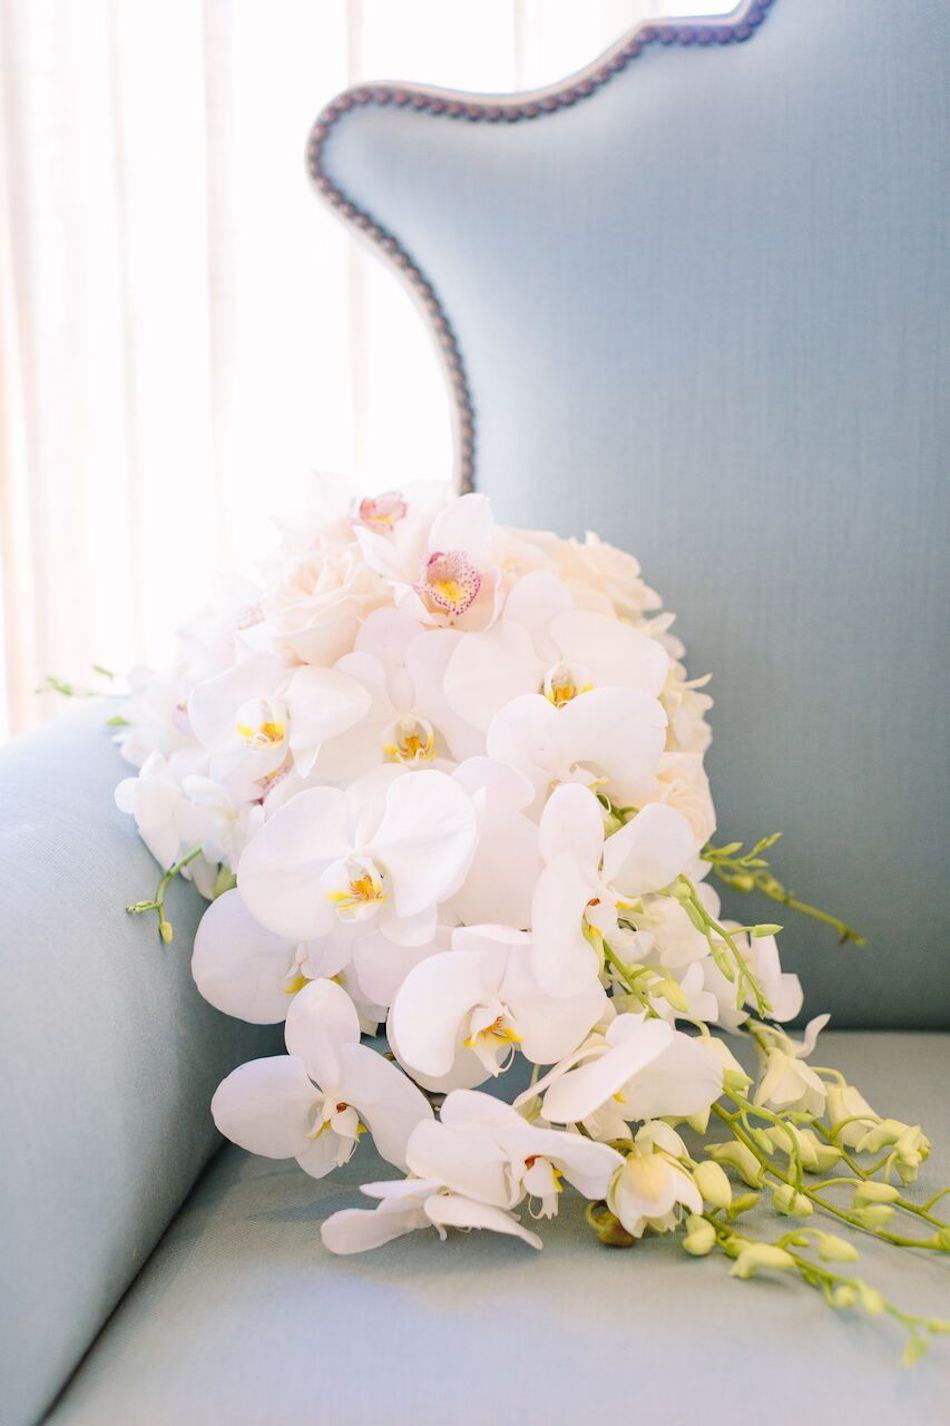 wedding bouquet, bouquet, wedding flowers, wedding florist, all white wedding, bel air bay club, flowers by cina